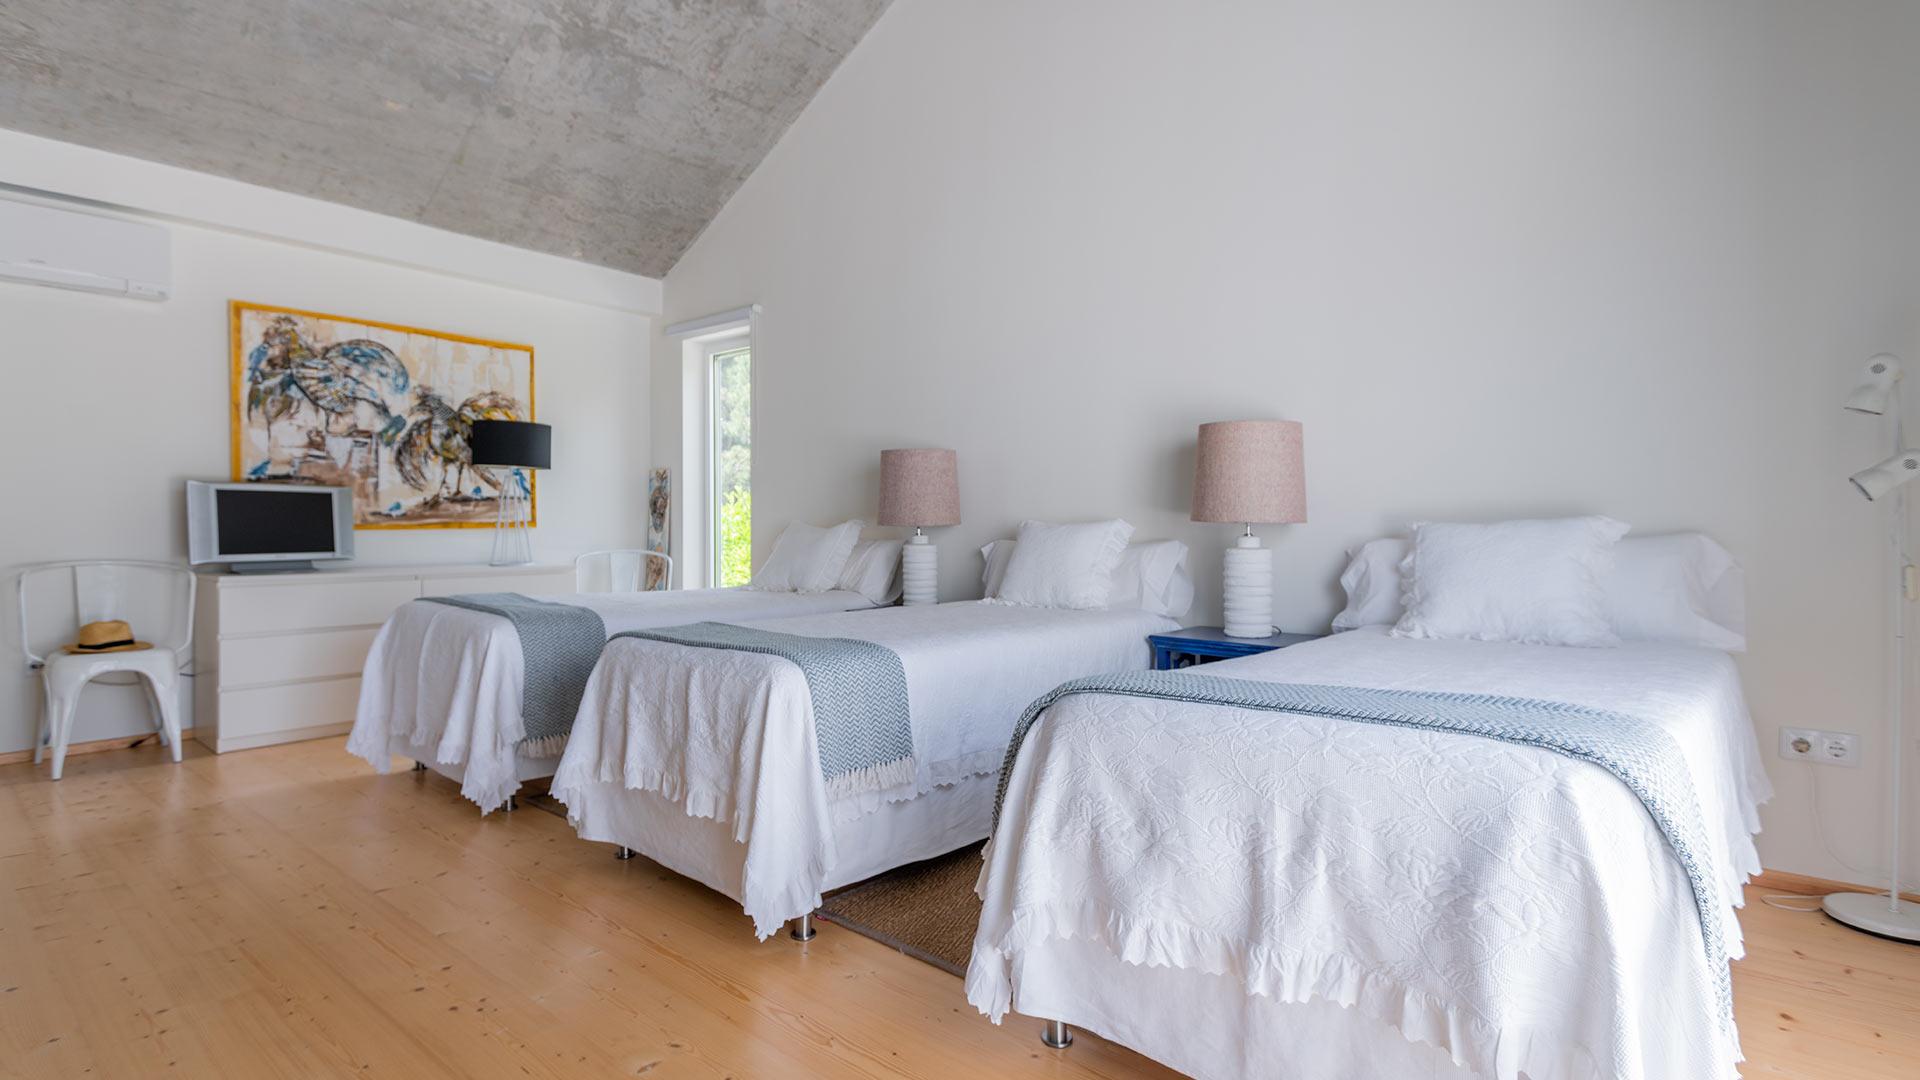 Fotos von der Villa Casa Da Oliveira in Comporta | Villanovo